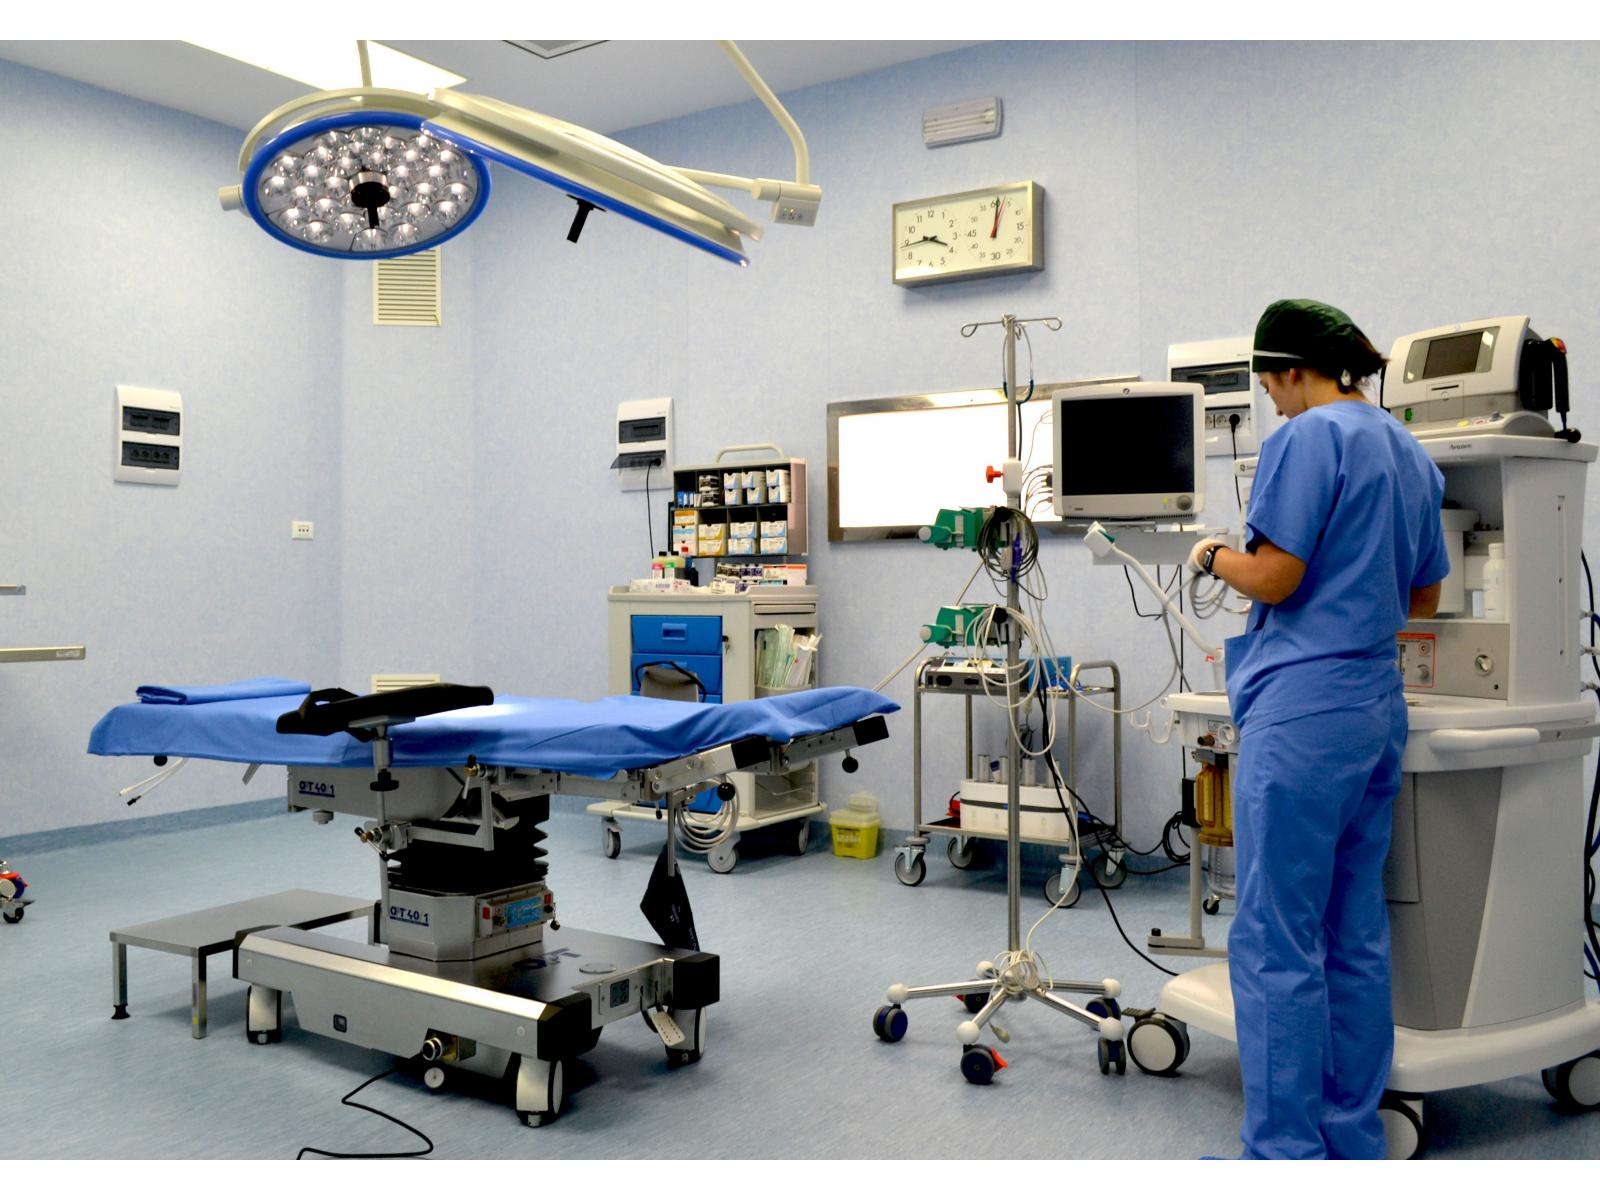 Spitalul Monza - sala_op.jpg